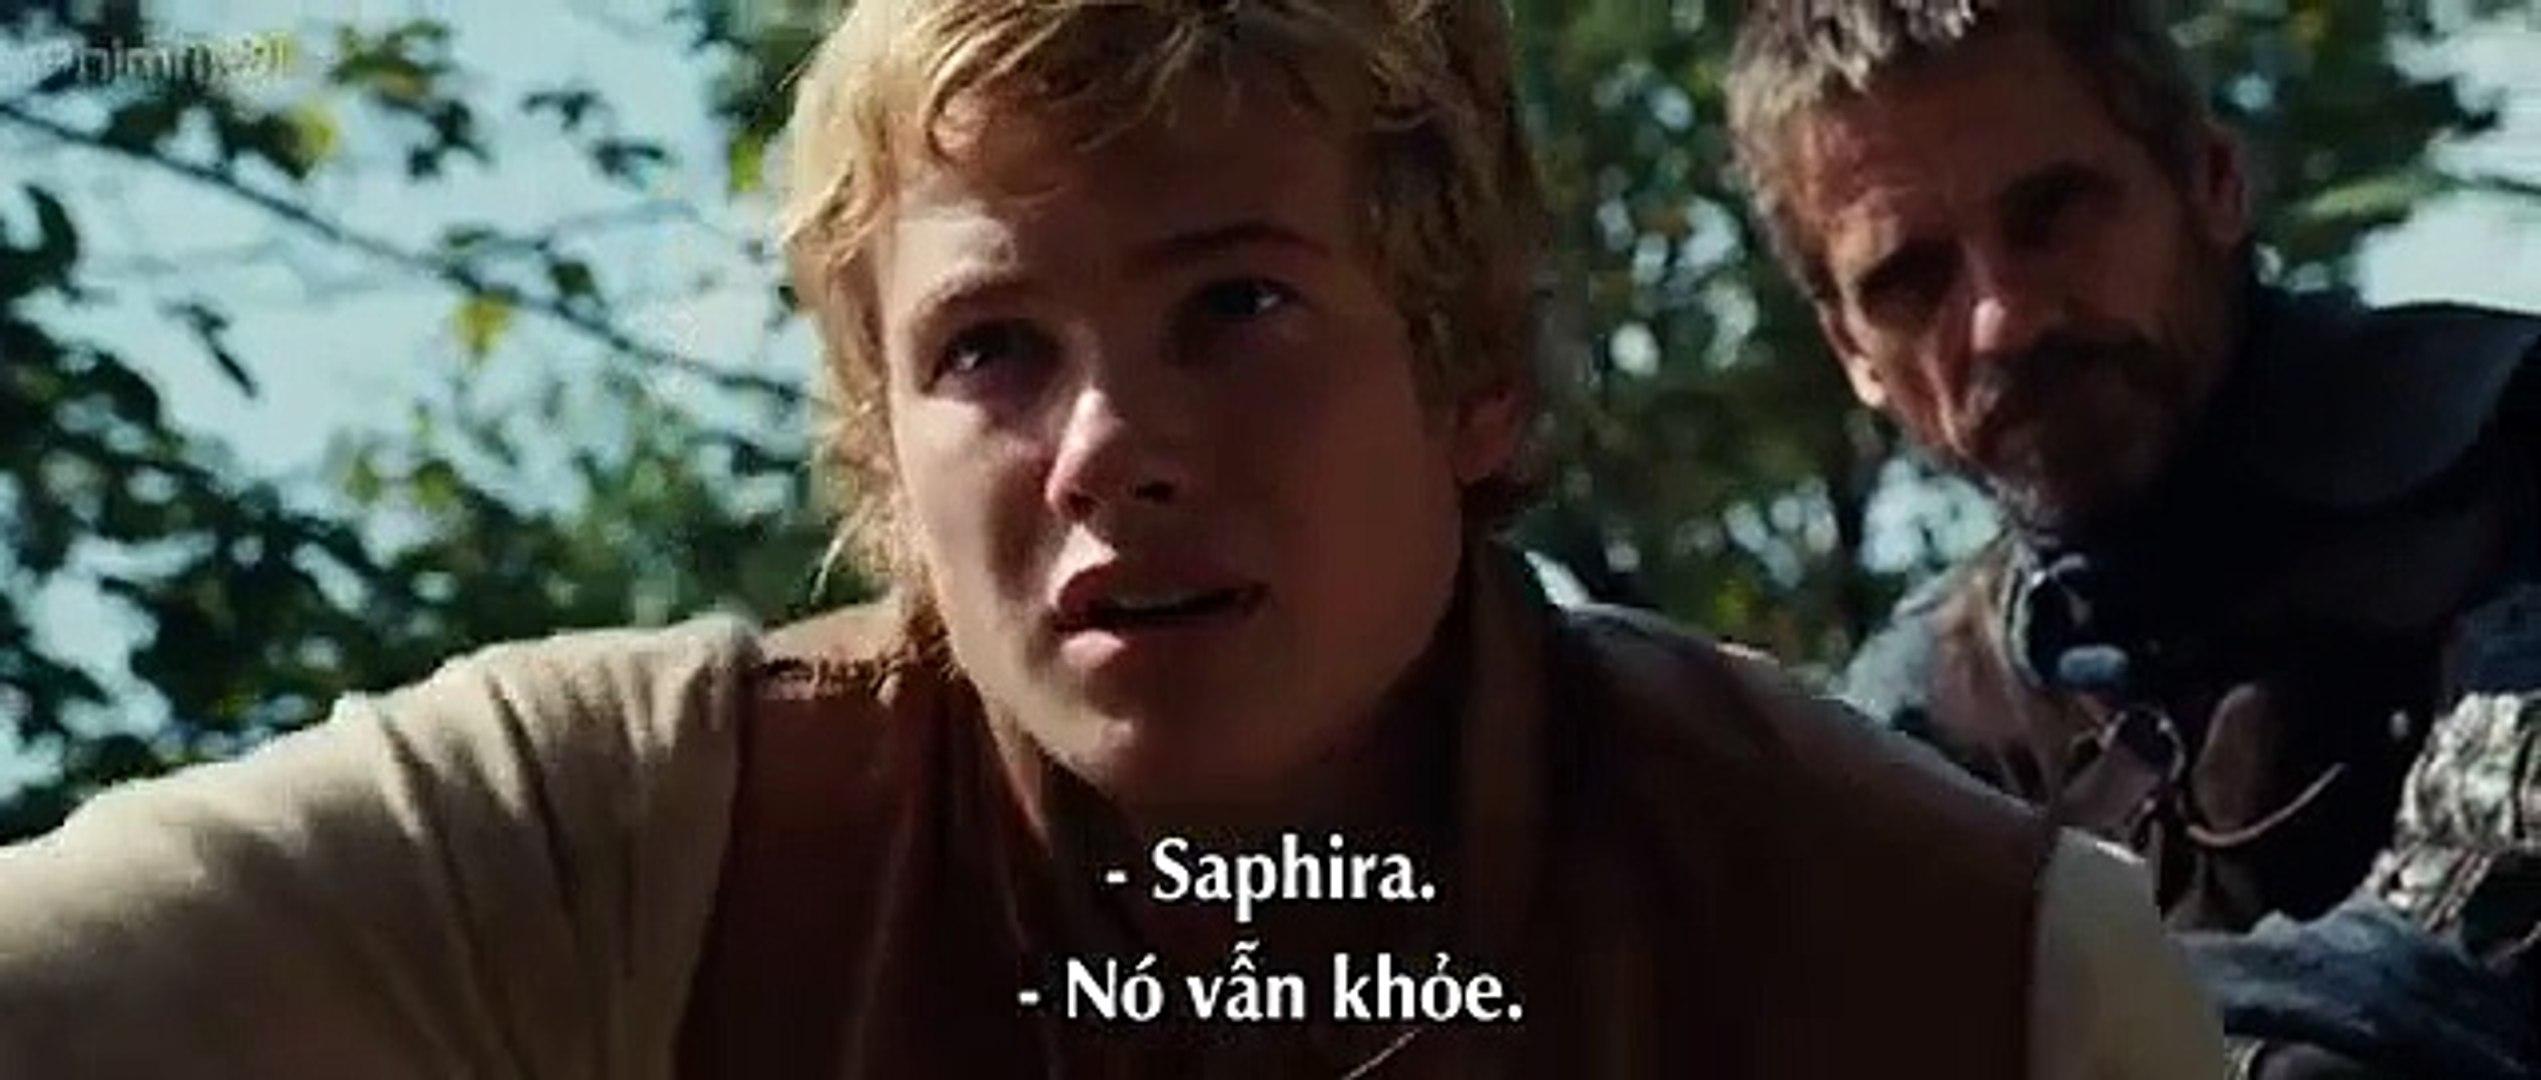 Eragon (2006)Full hd